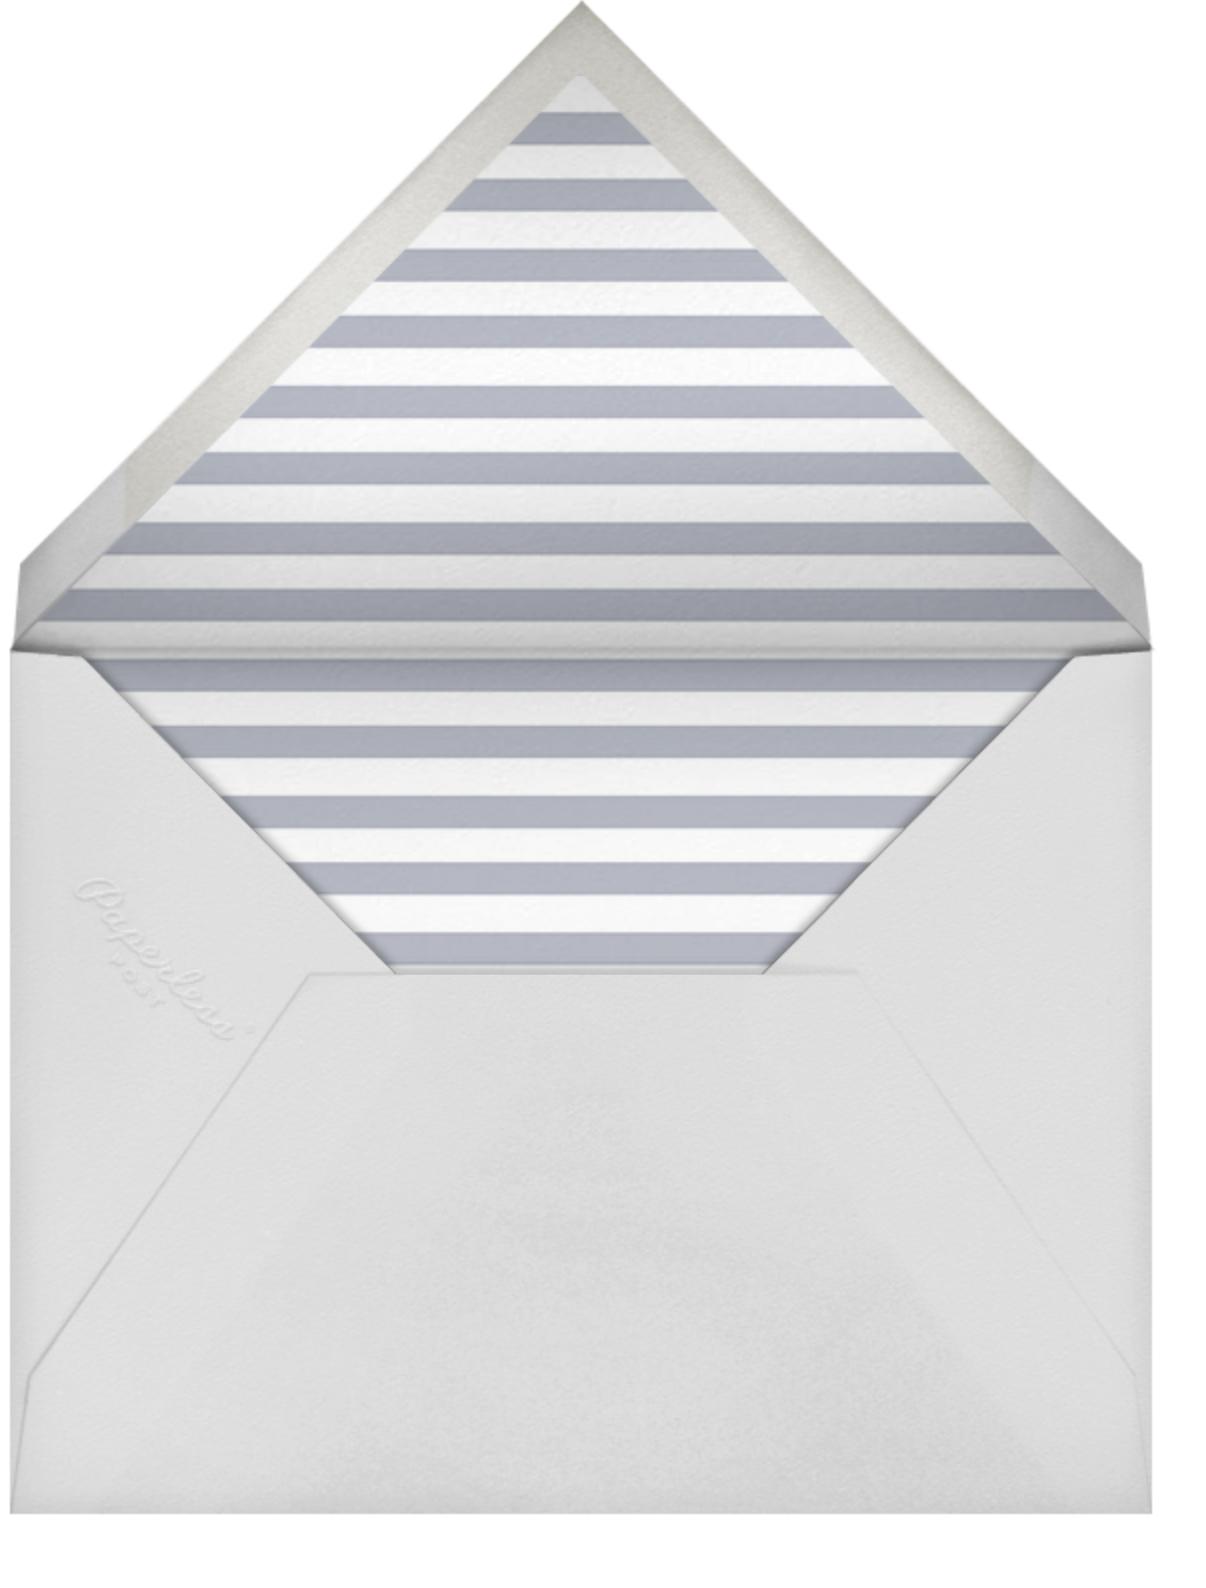 Celebration Dots - White/Pacific - Sugar Paper - Bachelorette party - envelope back